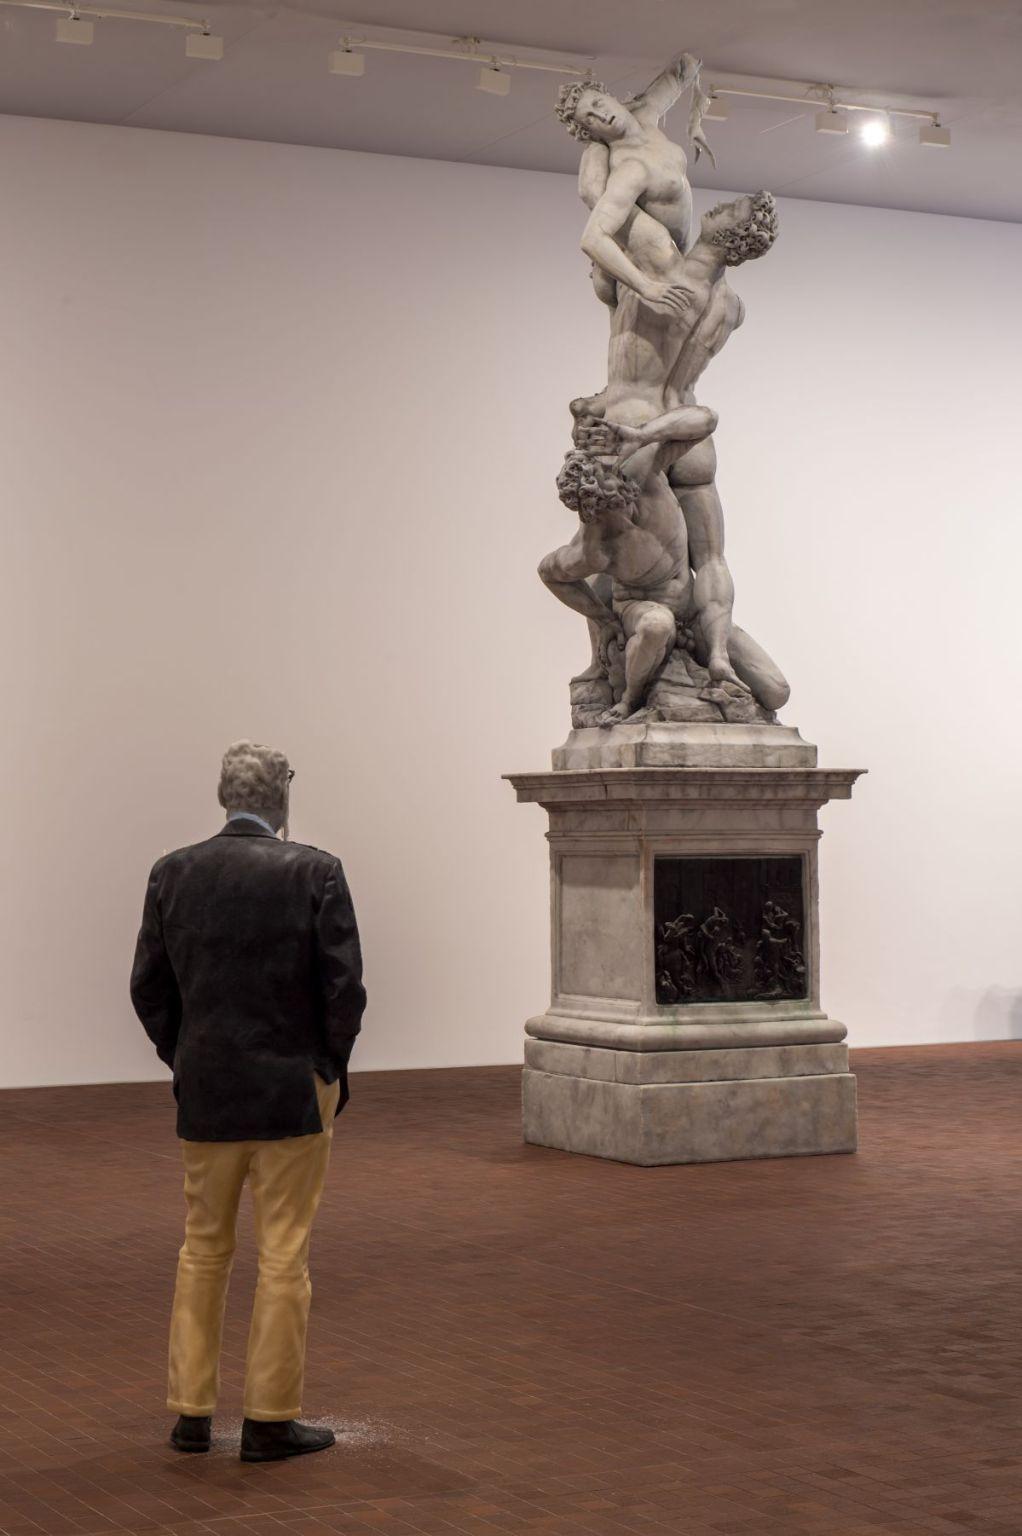 "Urs Fischer ""Untitled"" (2011) (Rudi Candle : The Rape of the Sabine Women) @ Collection Maja Hoffmann, LUMA Arles 2021"